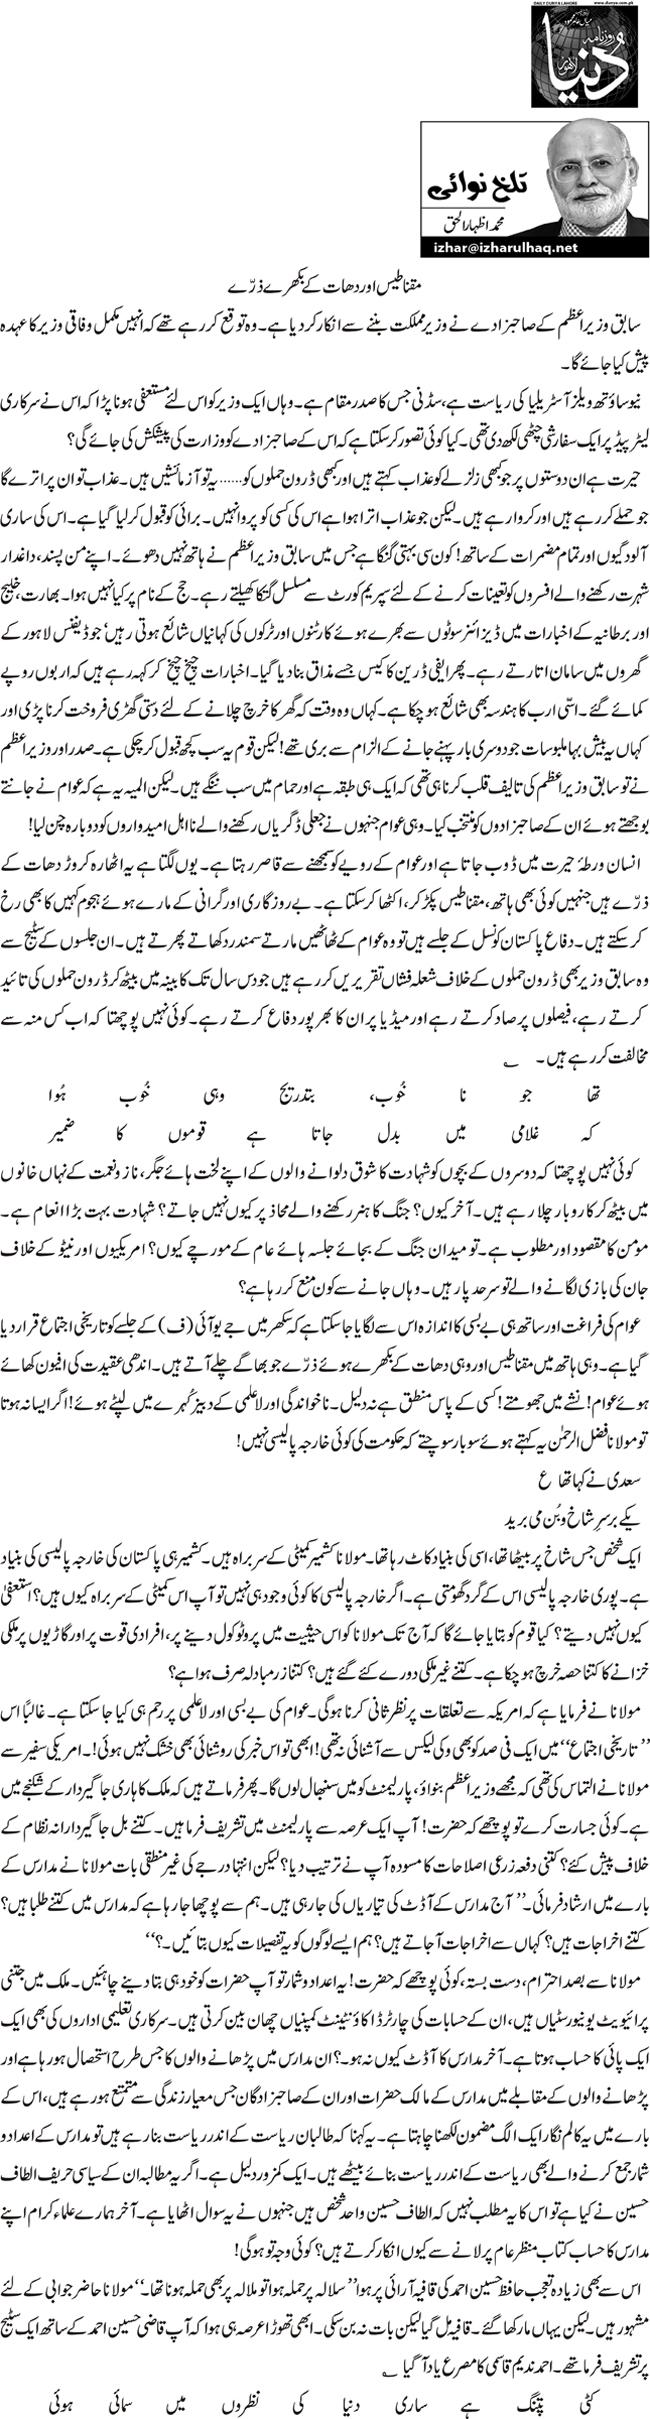 Maqnatees aur Dhat ky bekhry zary – Izhar ul Haq